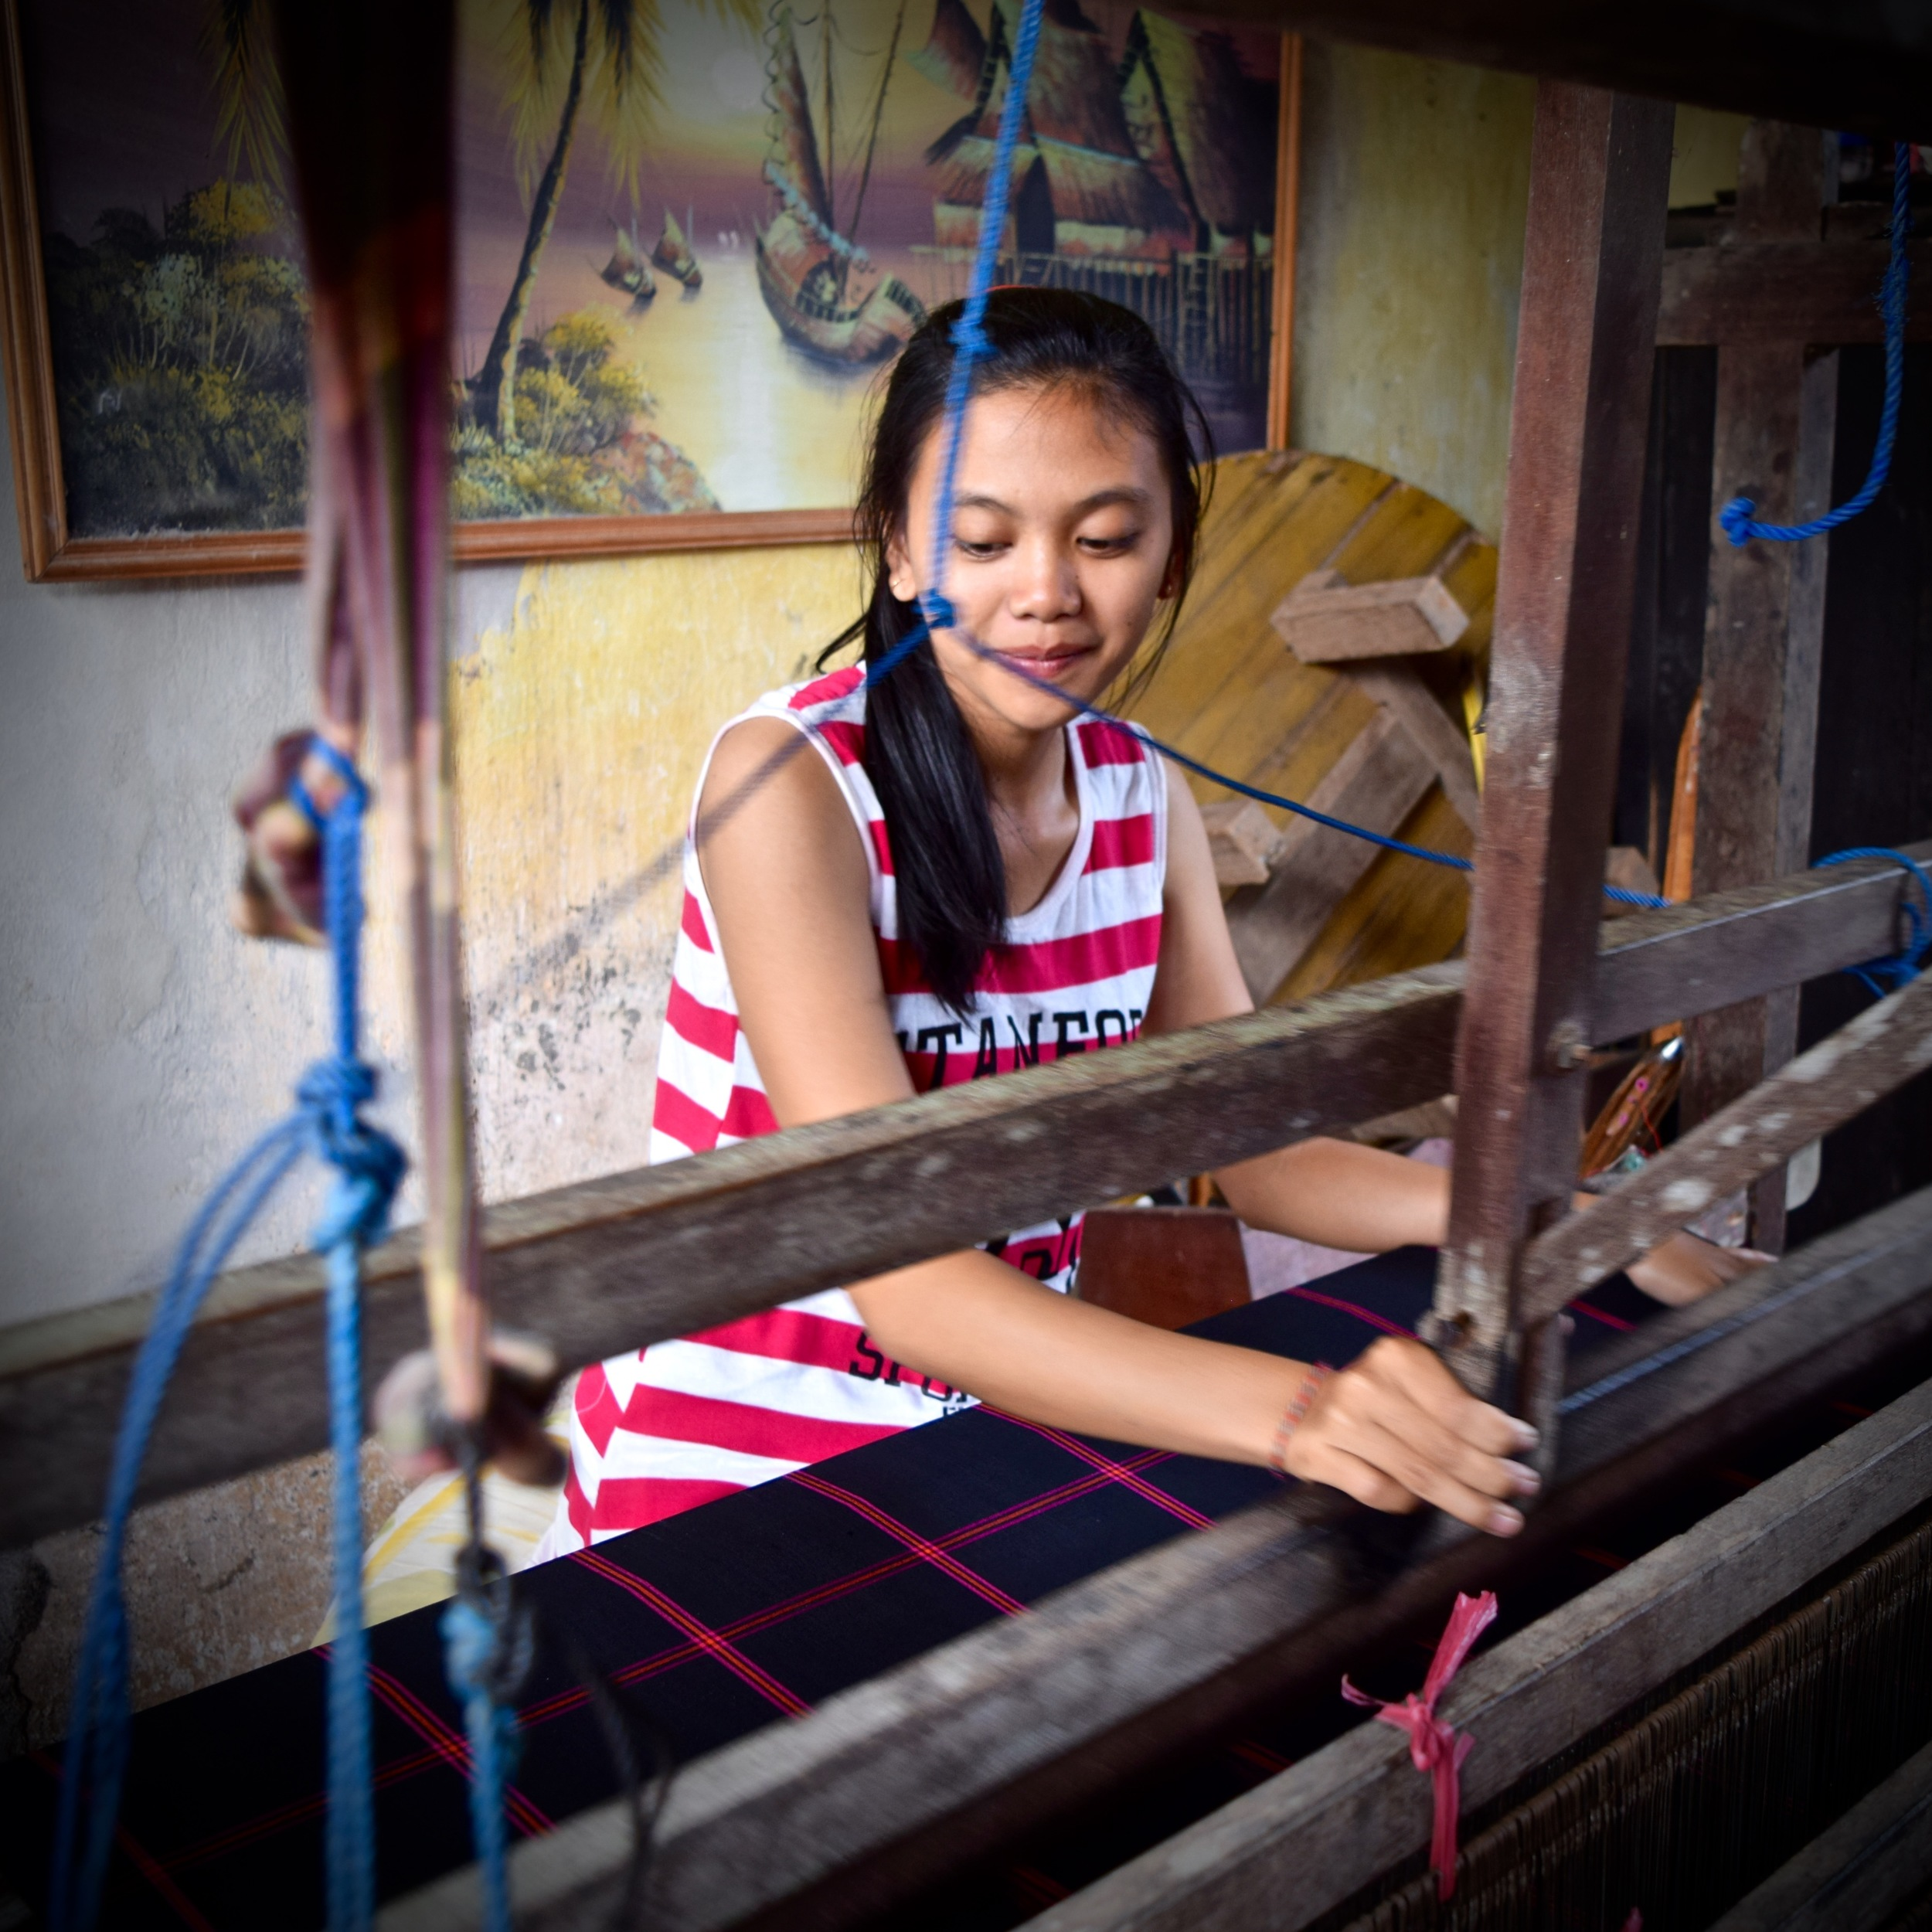 House of Diamonds Indonesia - Batik, Ikat and Kantha - How its made